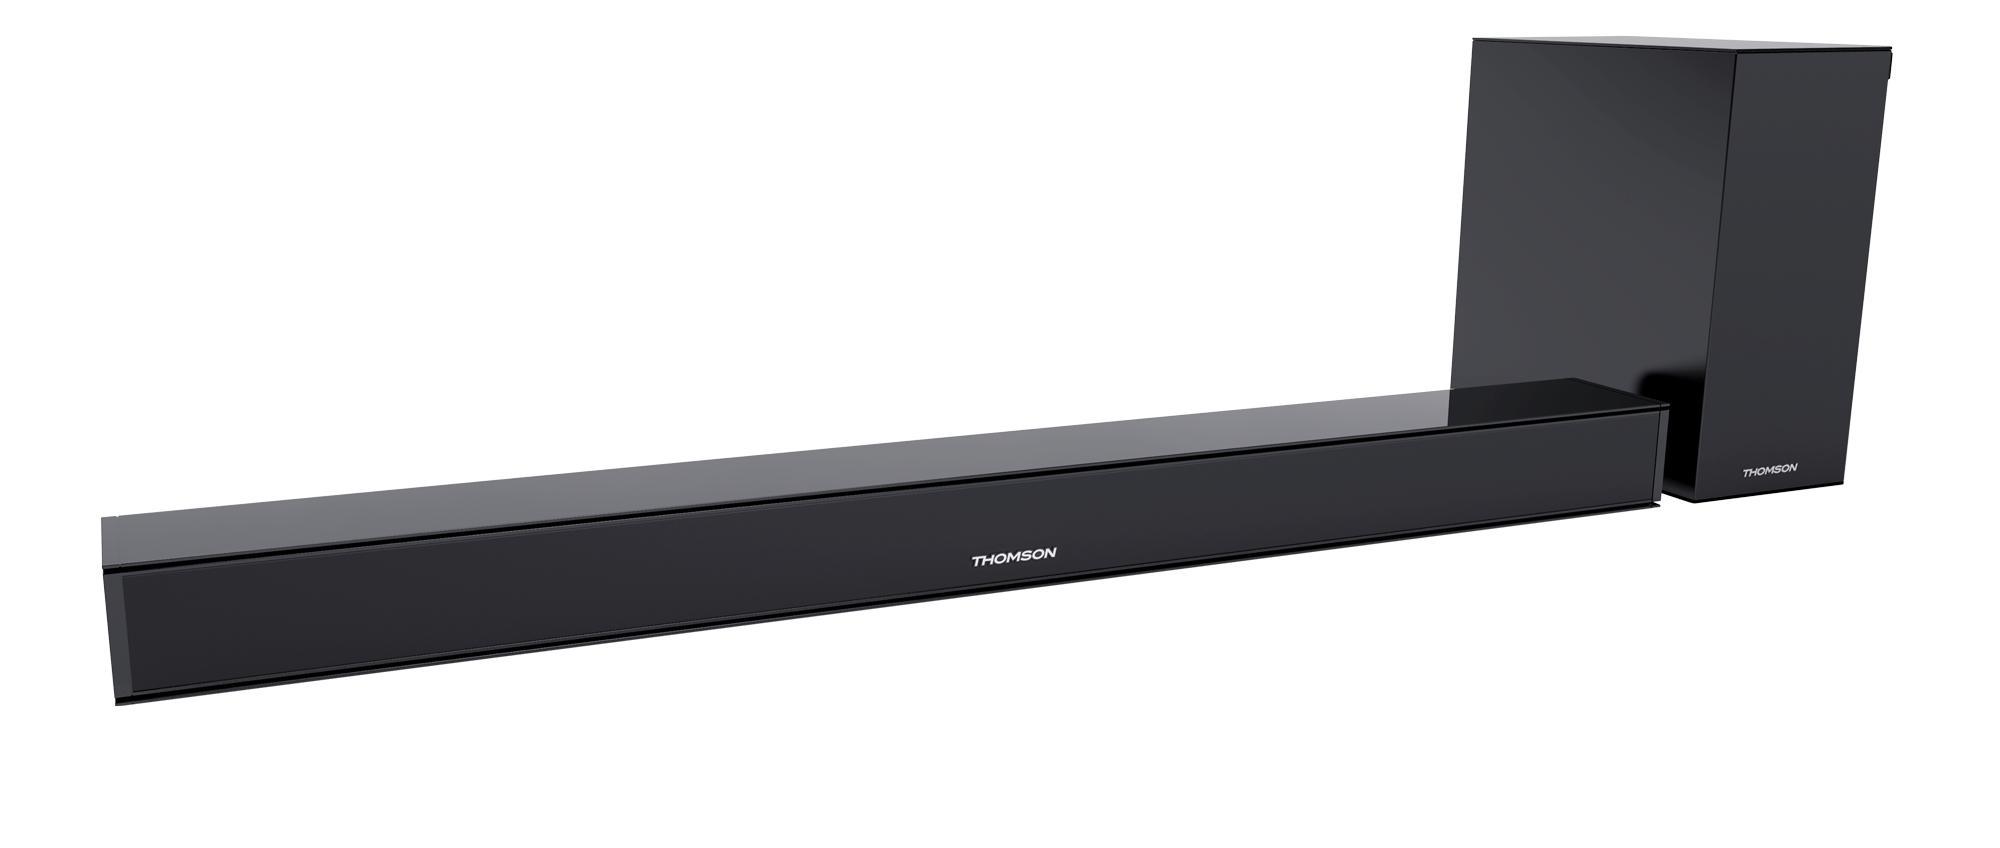 SB260IBT haut-parleur soundbar 2.1 canaux 300 W Noir